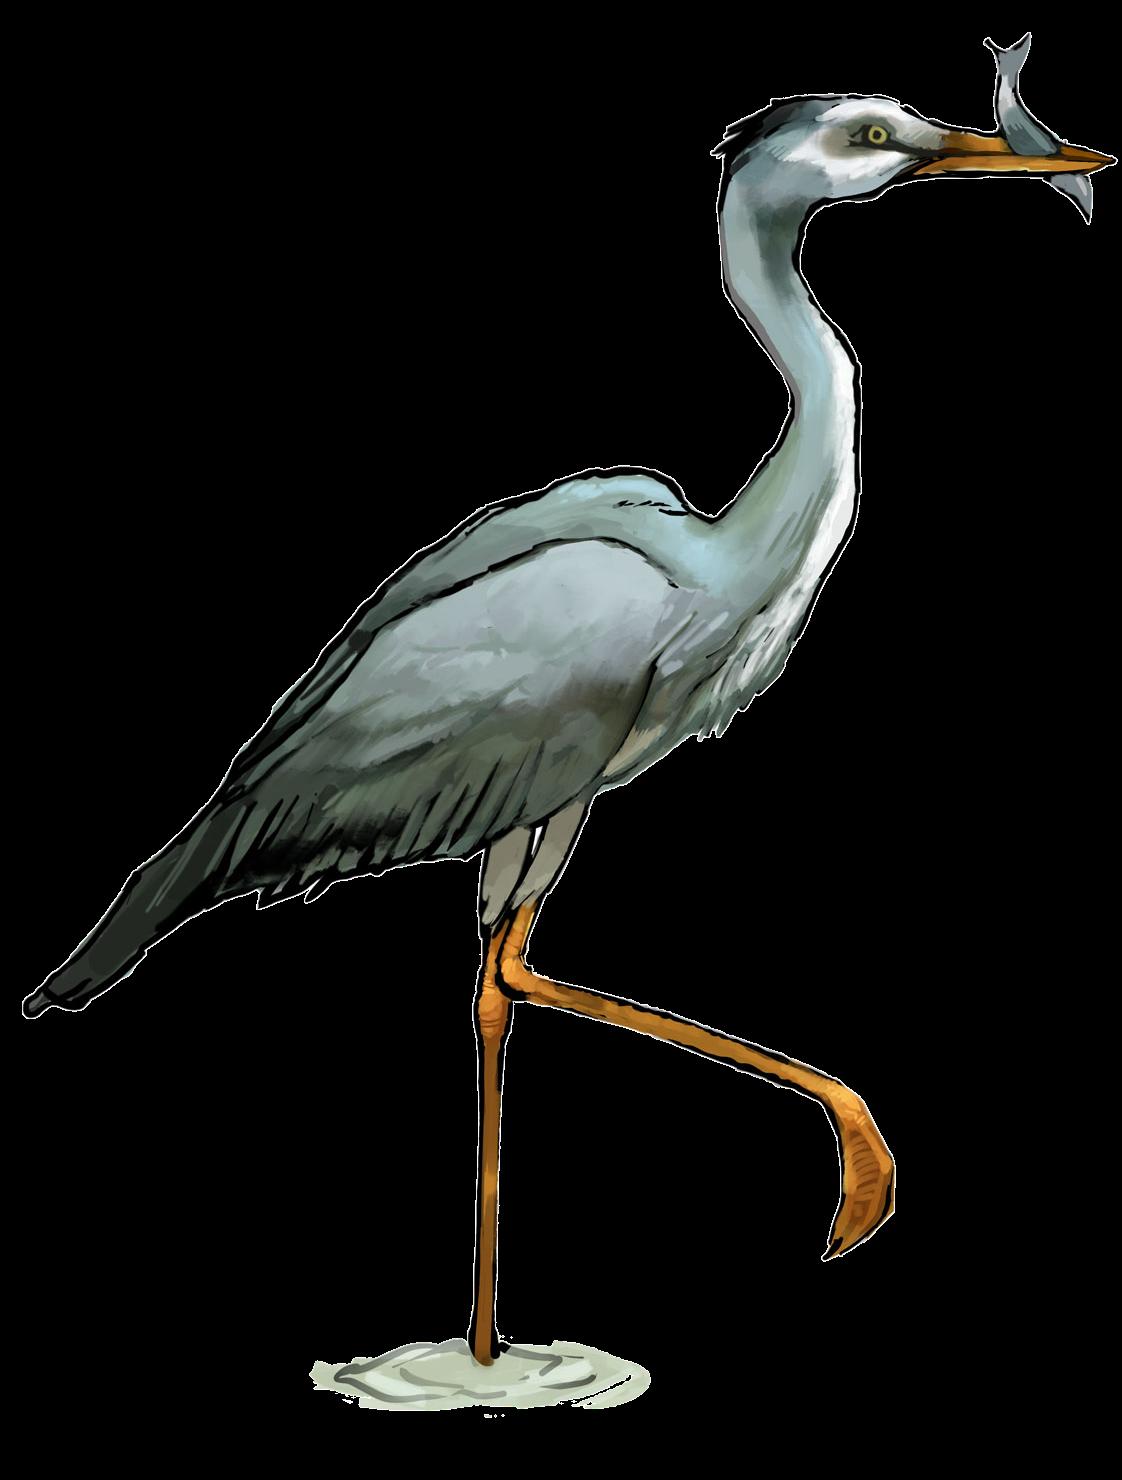 Clipart heron.